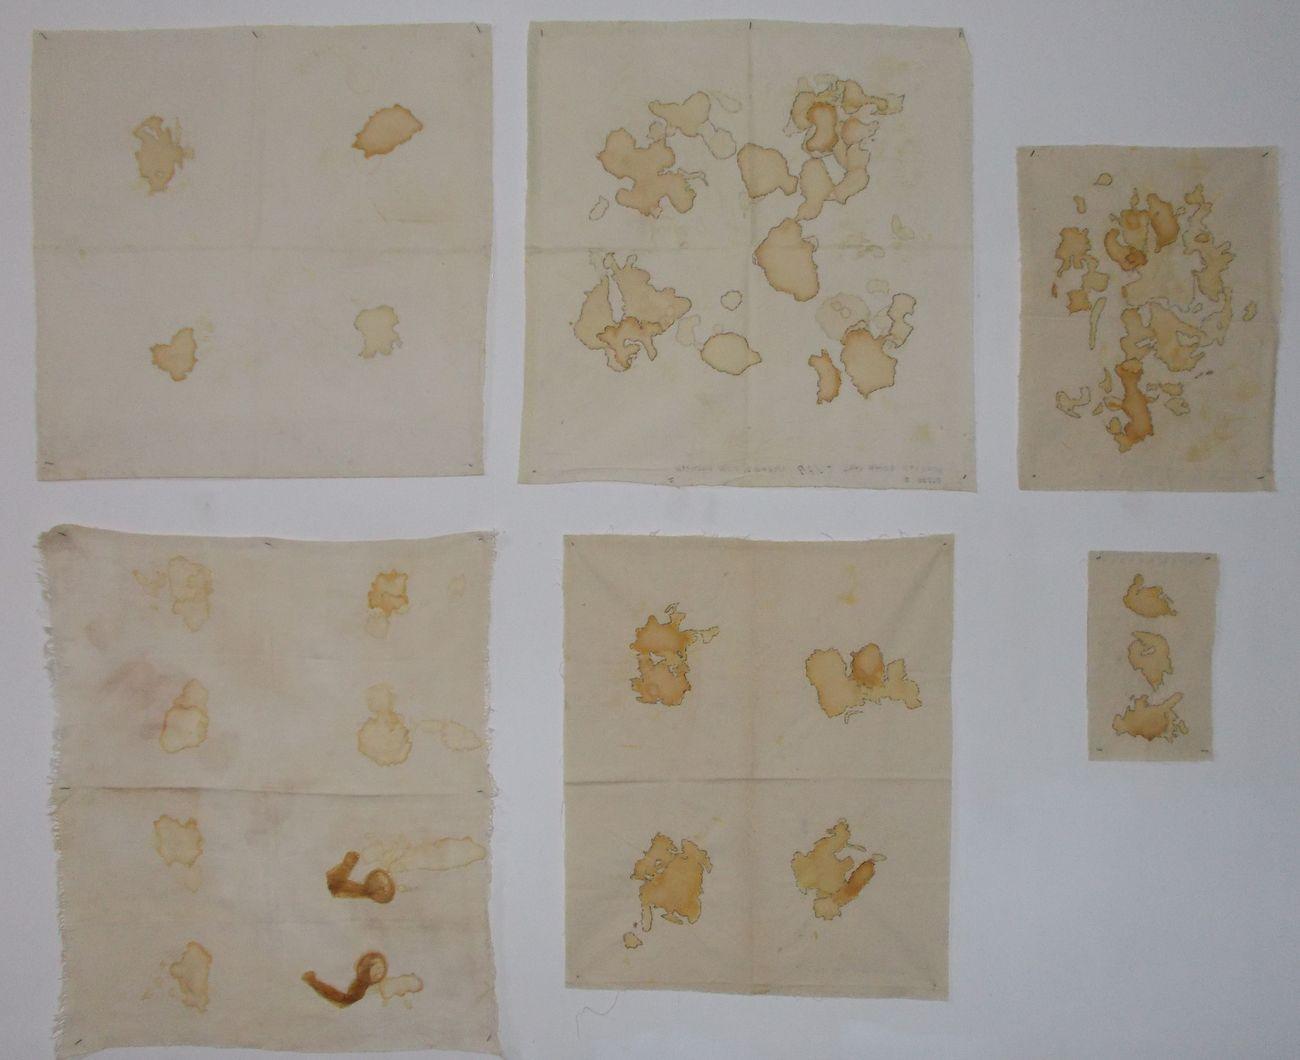 Pino Boresta, Sperma su tessuto, 1995-96